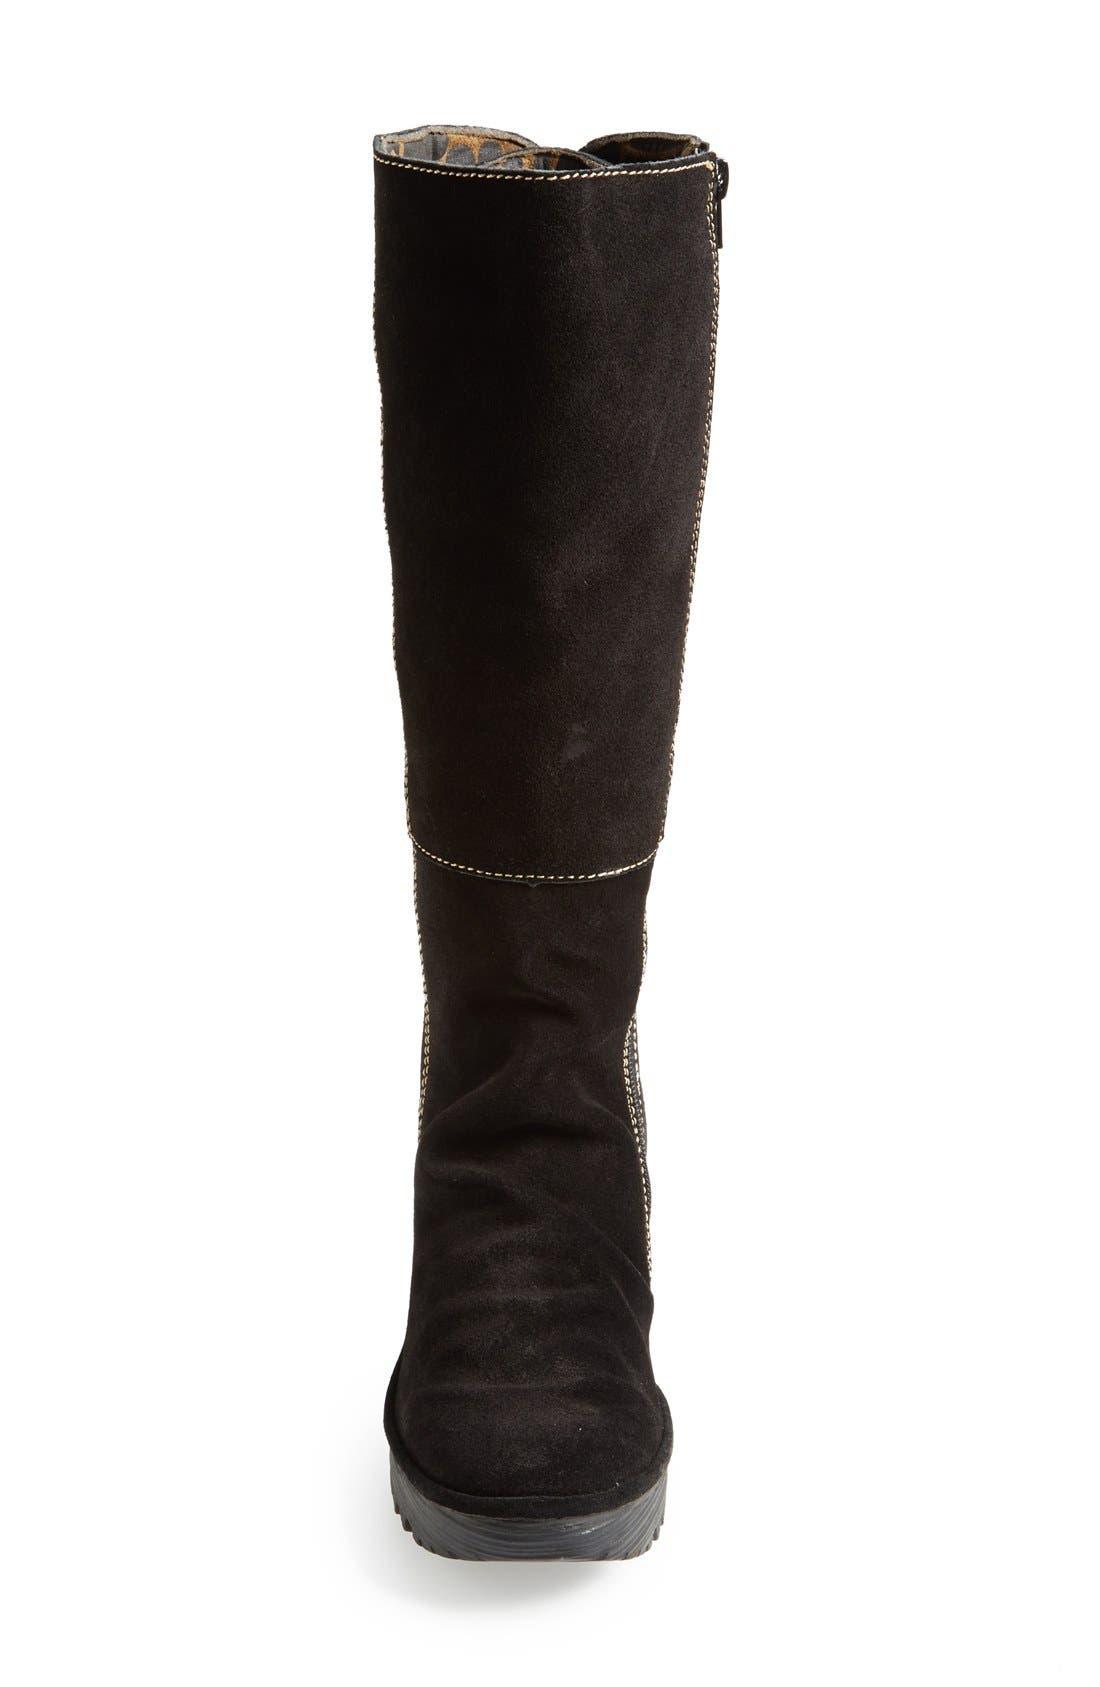 'Yust' Knee High Platform Wedge Boot,                             Alternate thumbnail 3, color,                             Black Suede